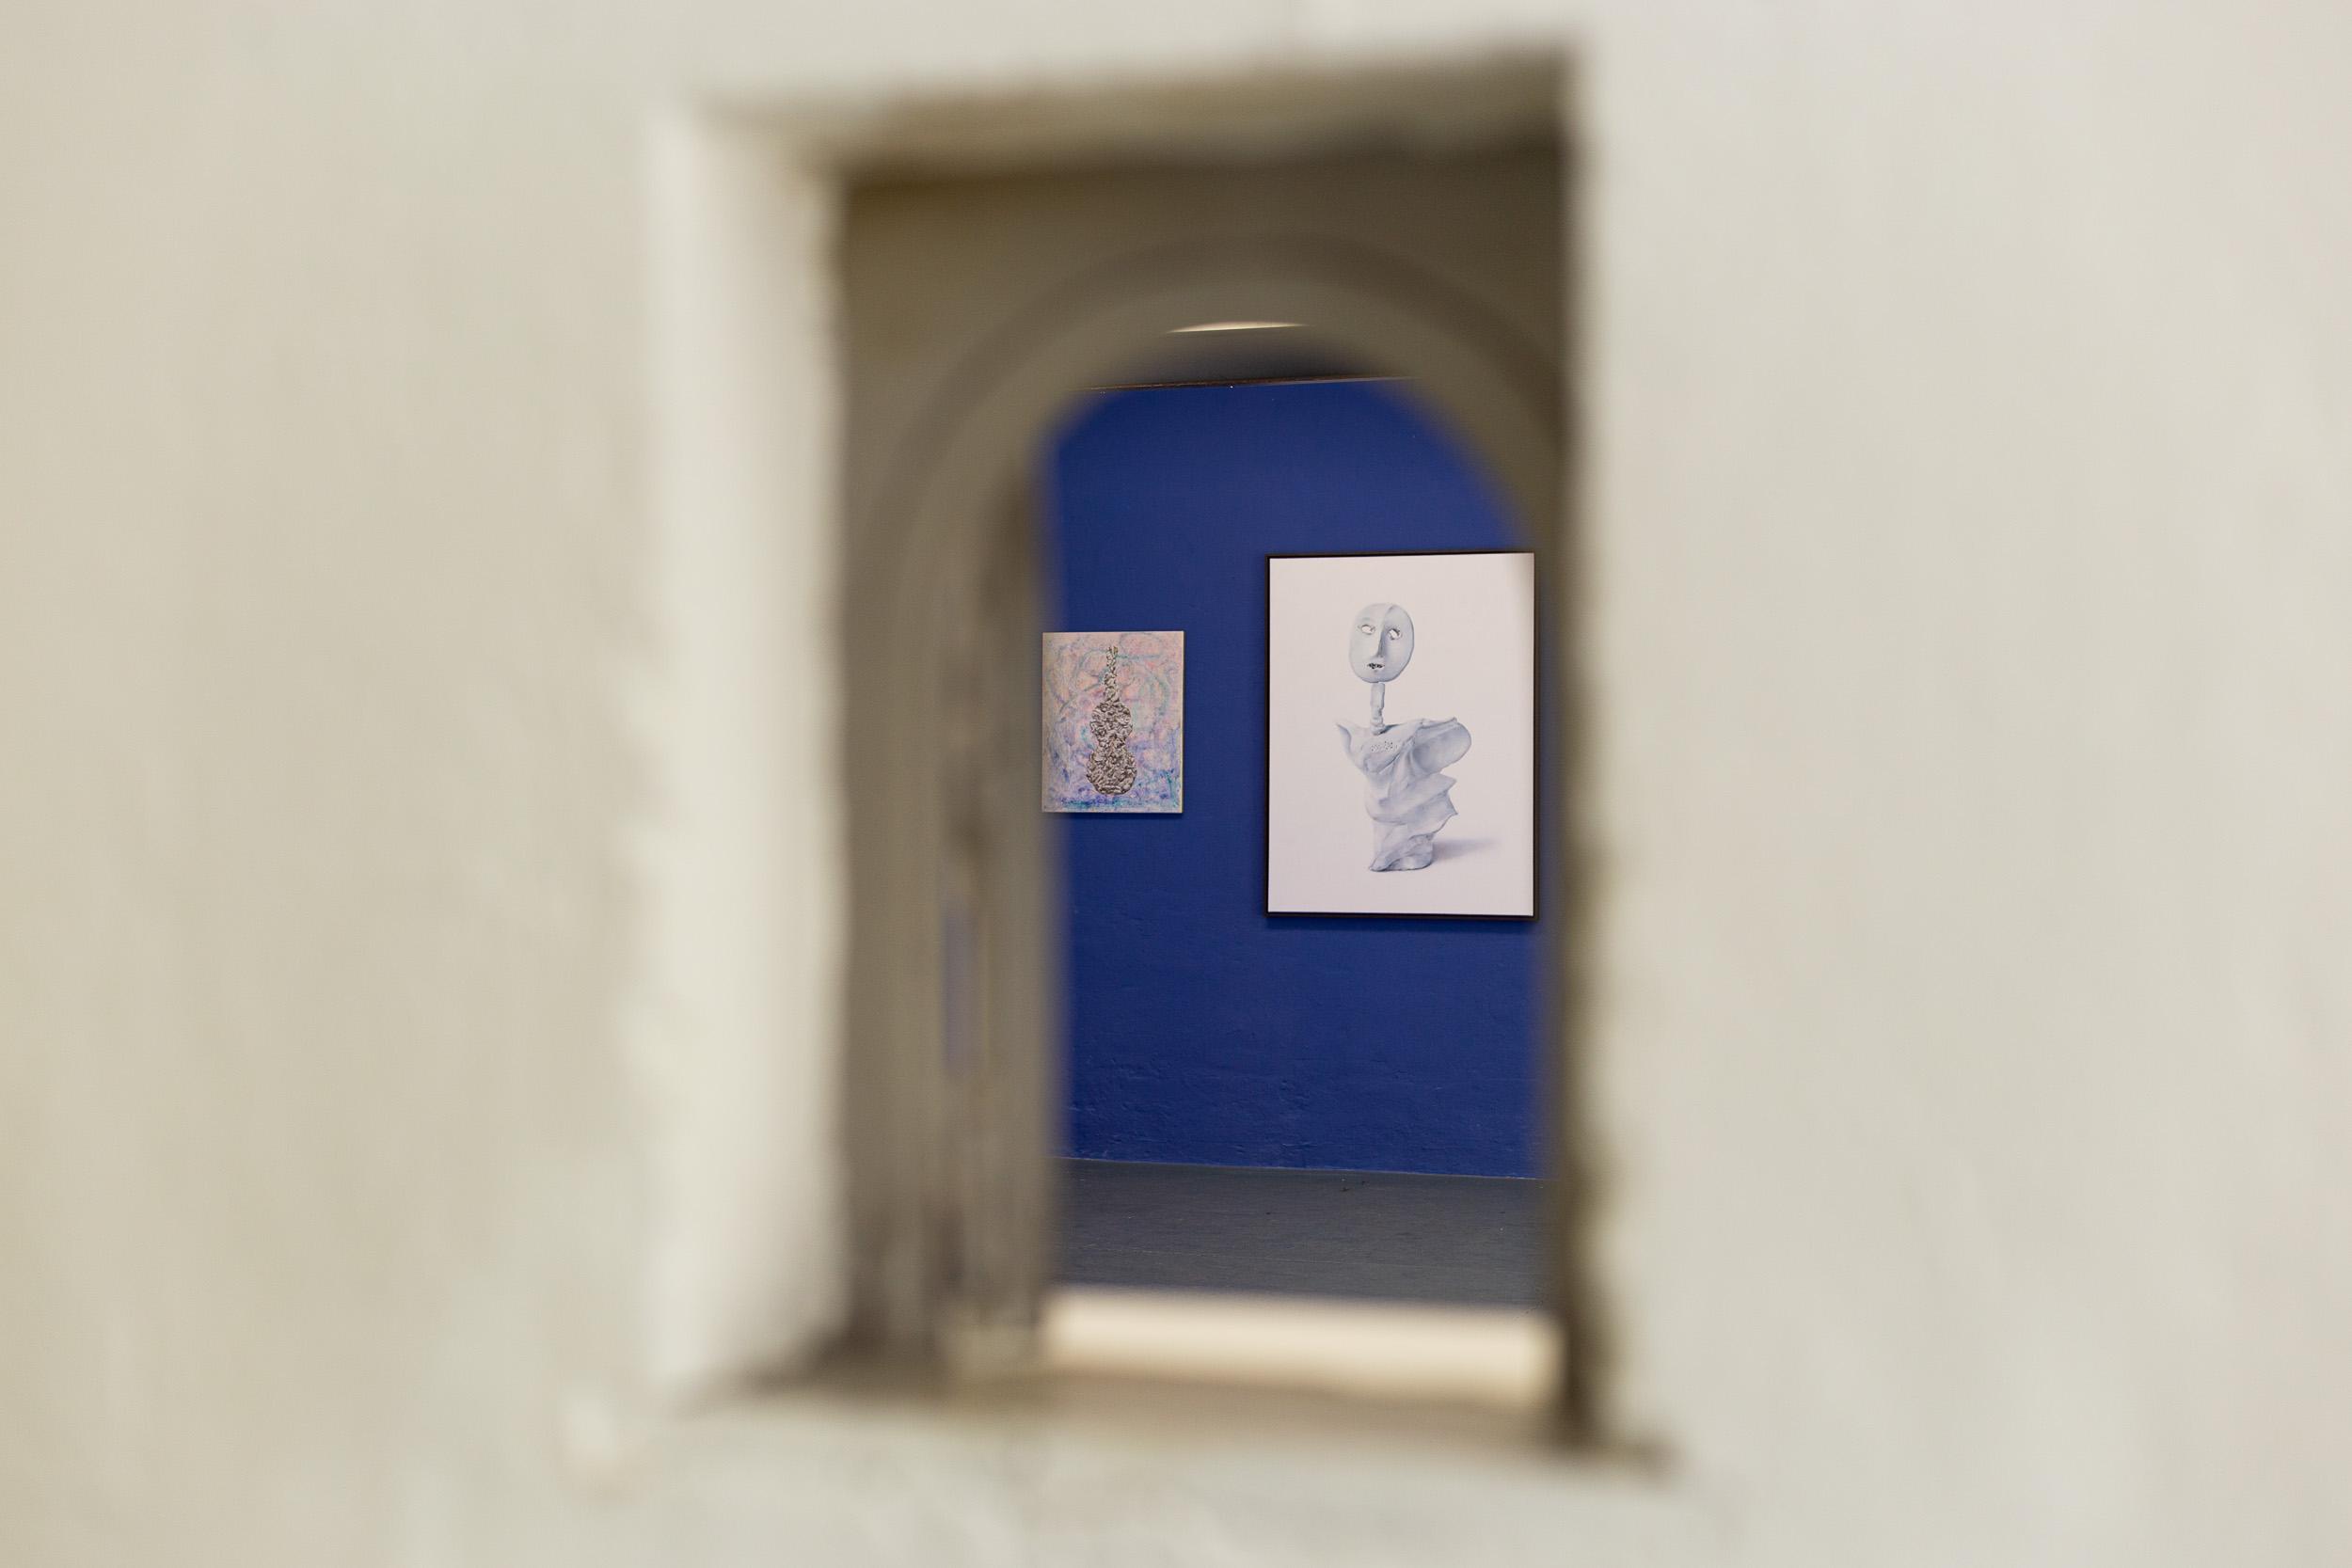 Left: Francisco Sierra,  Violino classic alle mandorle , 2016, oil on canvas, 60 x 50 cm  Right: Francisco Sierra,  Ålmos , 2016, oil on canvas, 116 x 90 cm  Photo: Kilian Bannwart